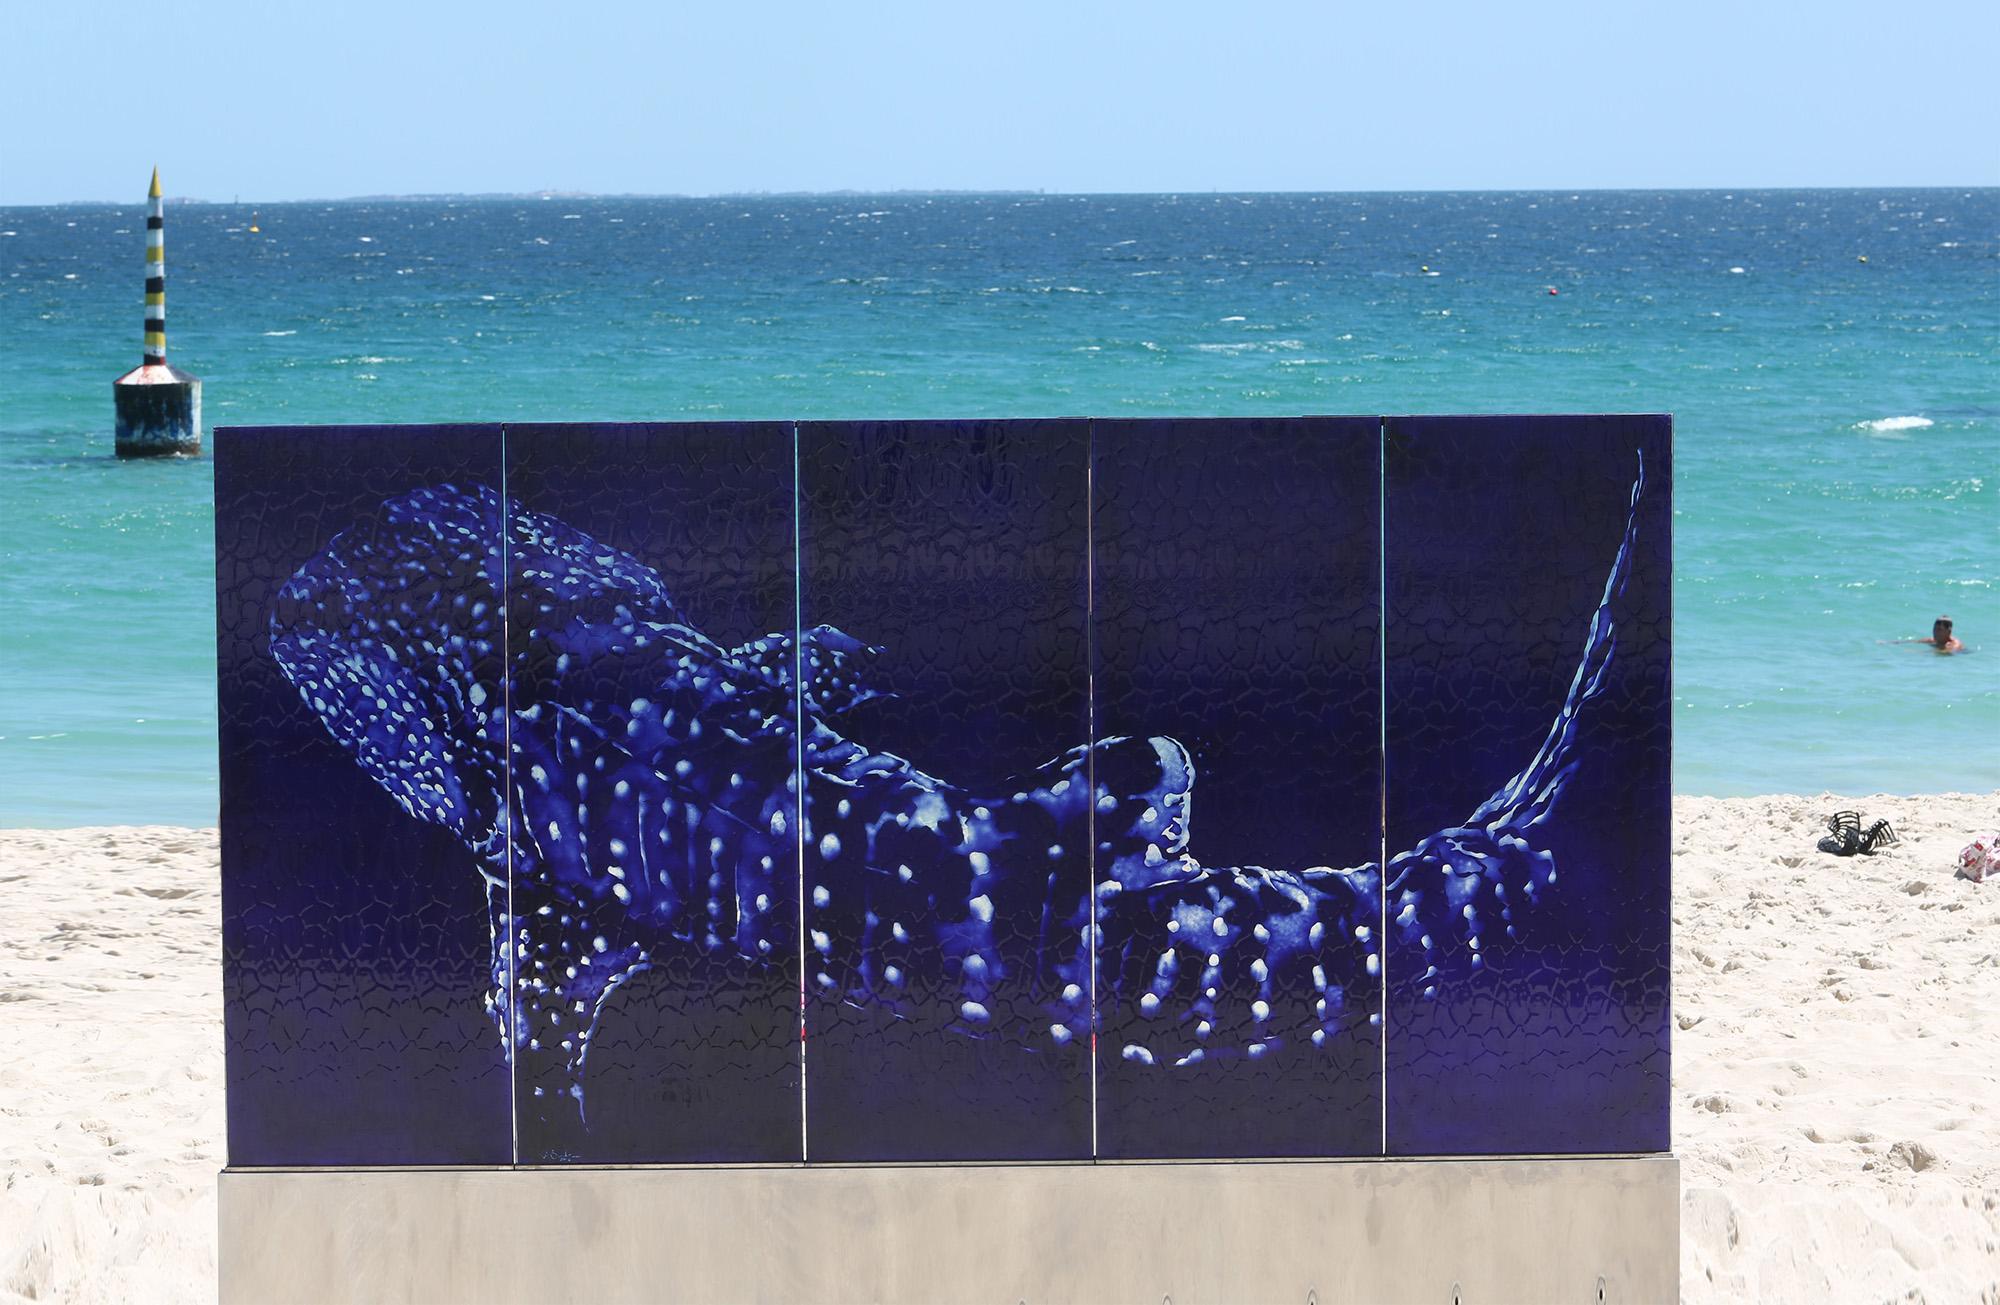 dd001944e Beach Access Day 17 March: - Sculpture by the Sea